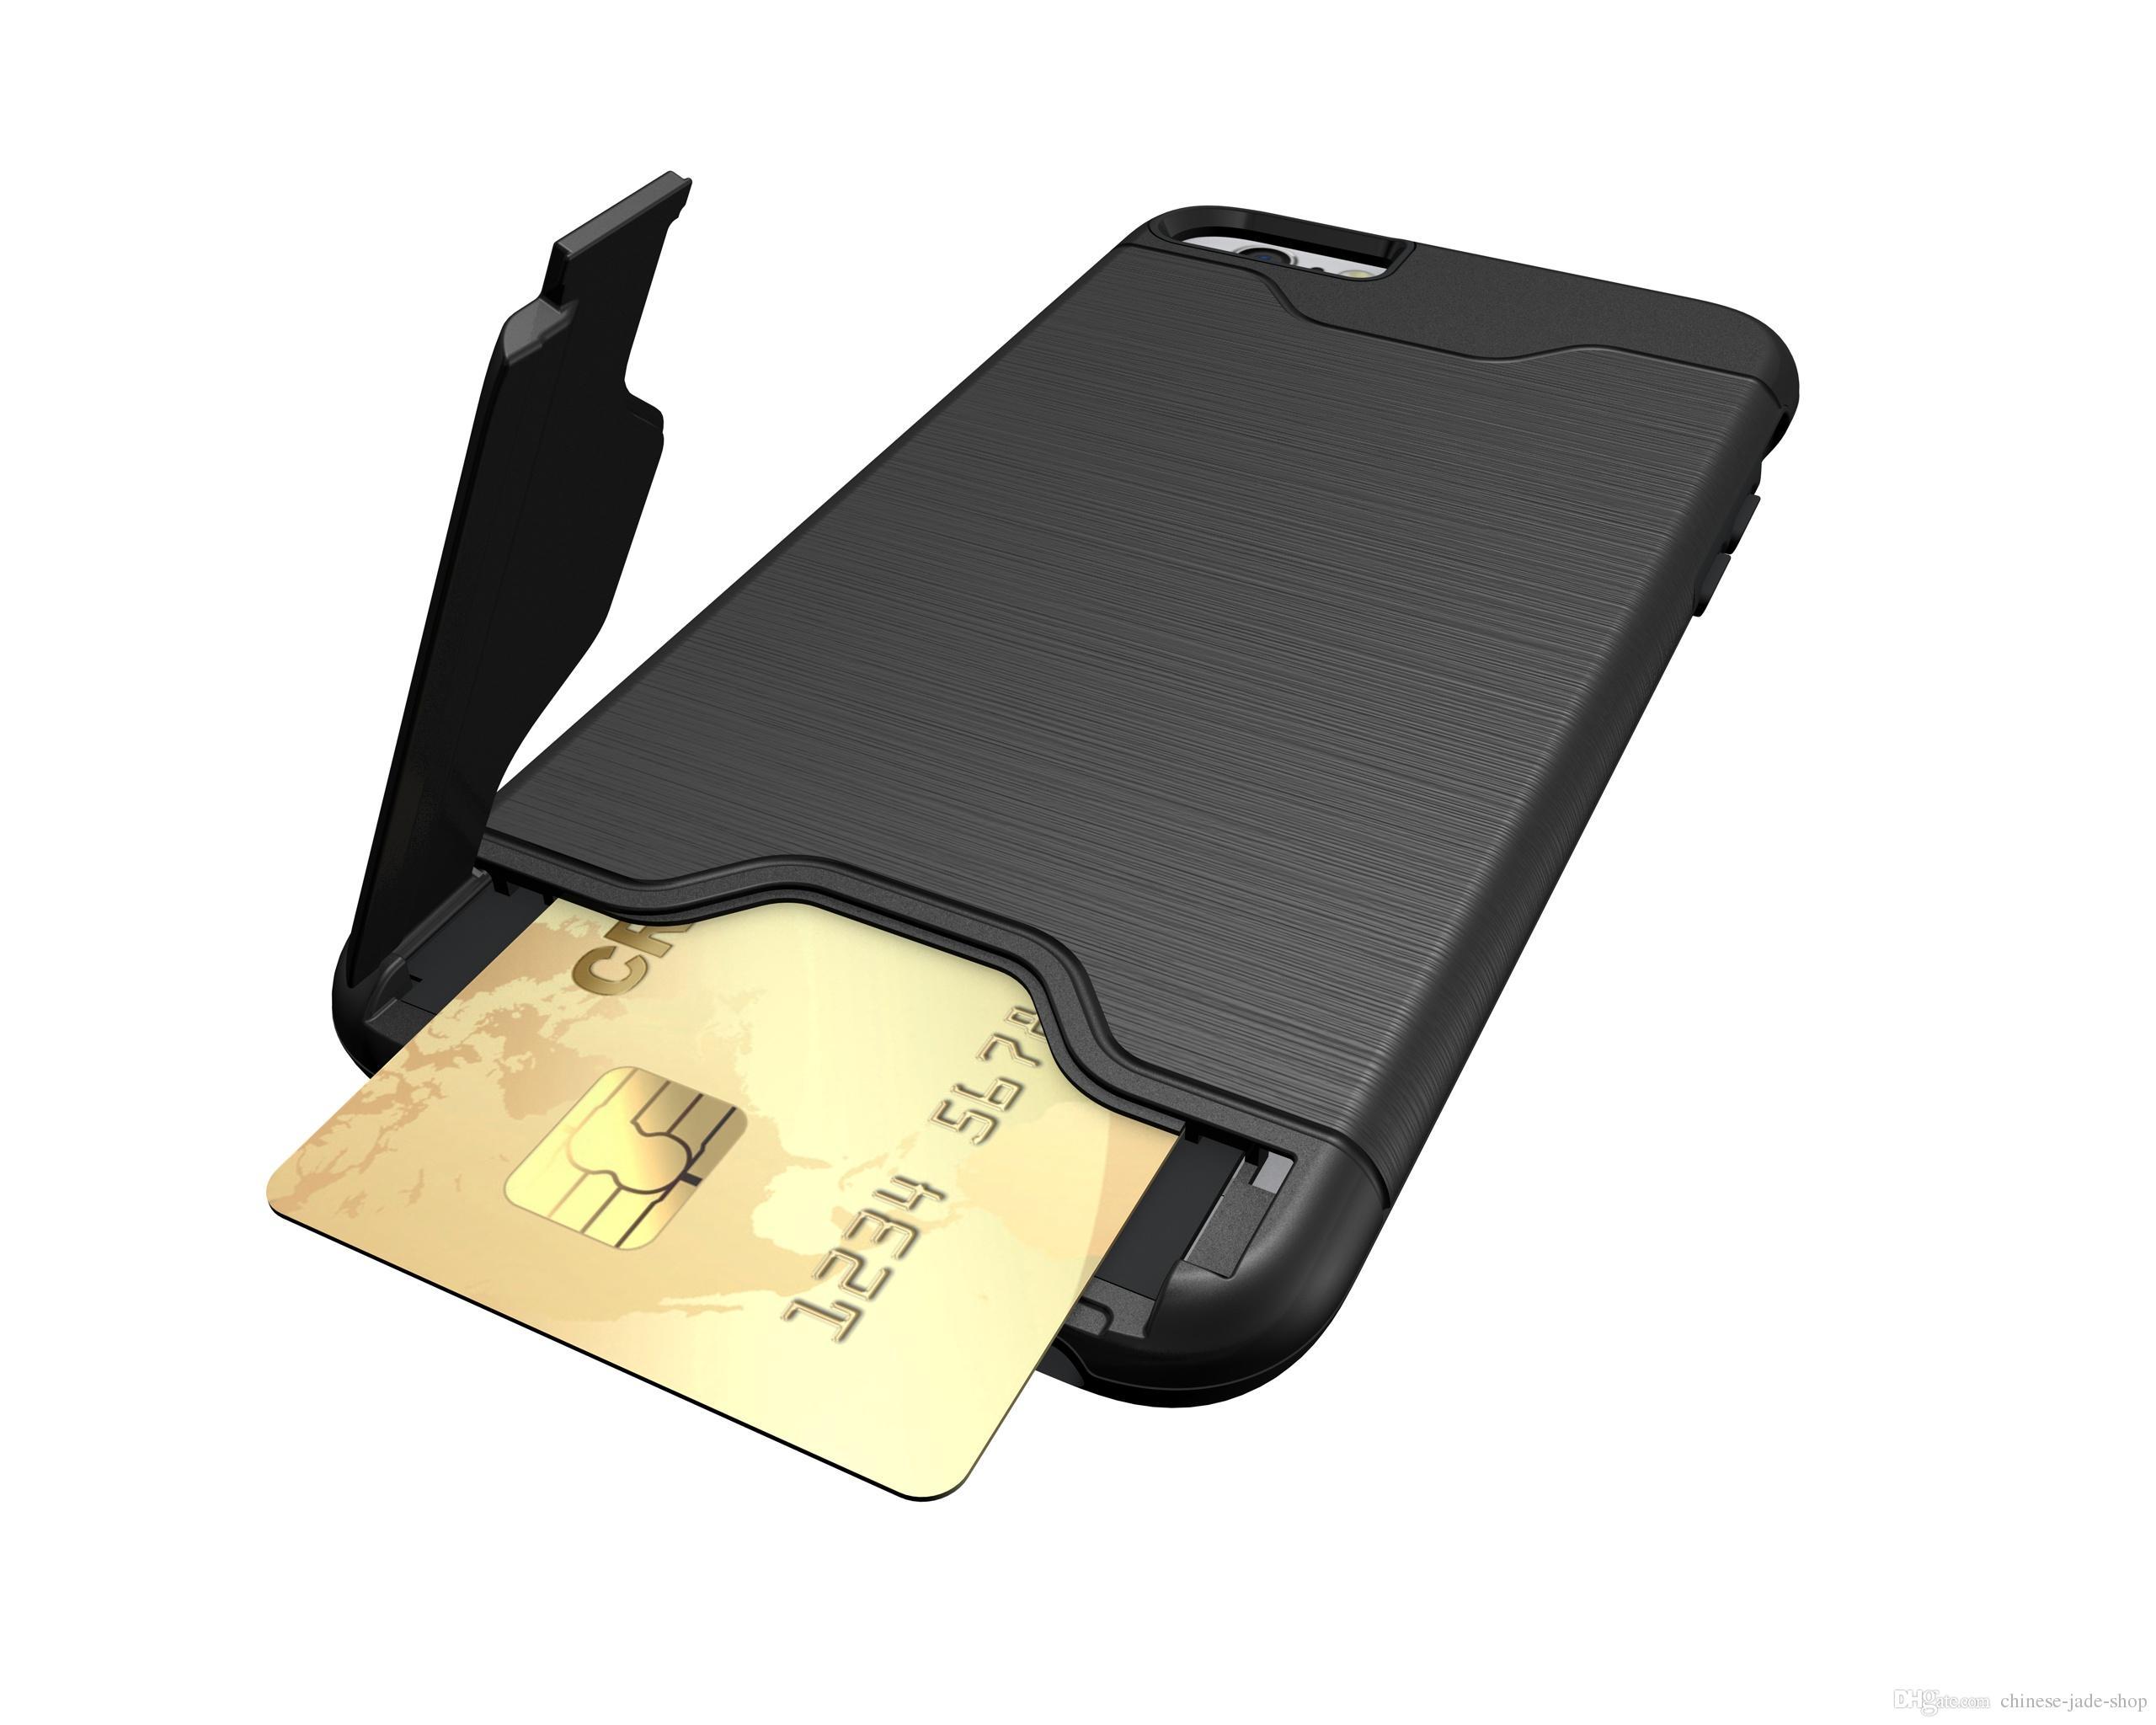 Hybrid Armor Geborsteld Houder Creditcard Pocket Cover Case Kickstand voor iPhone 11 PRO 11 PRO MAX 6 7 8 PLUS XR XS XS MAX 160PCS / PARTIJ